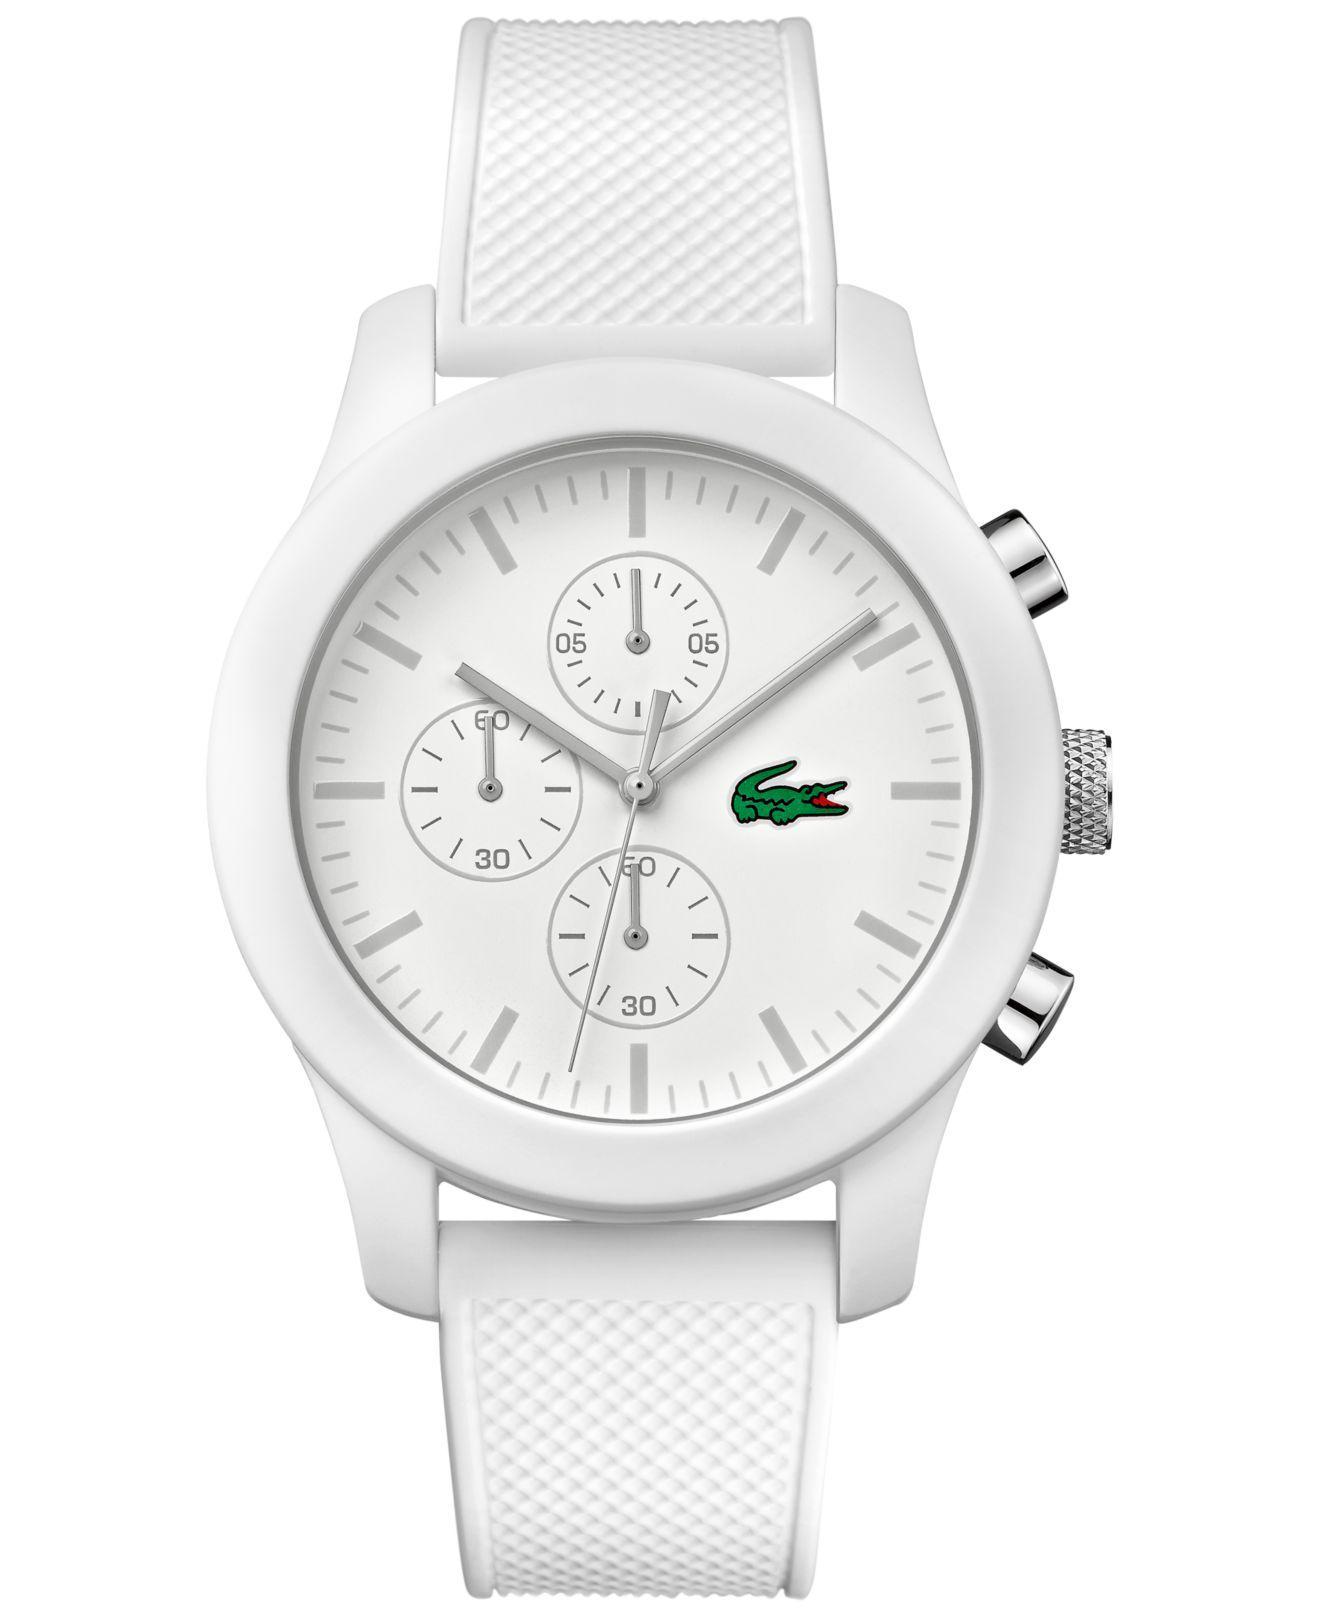 Lacoste. Men's Chronograph 12.12 White Silicone Strap Watch ...